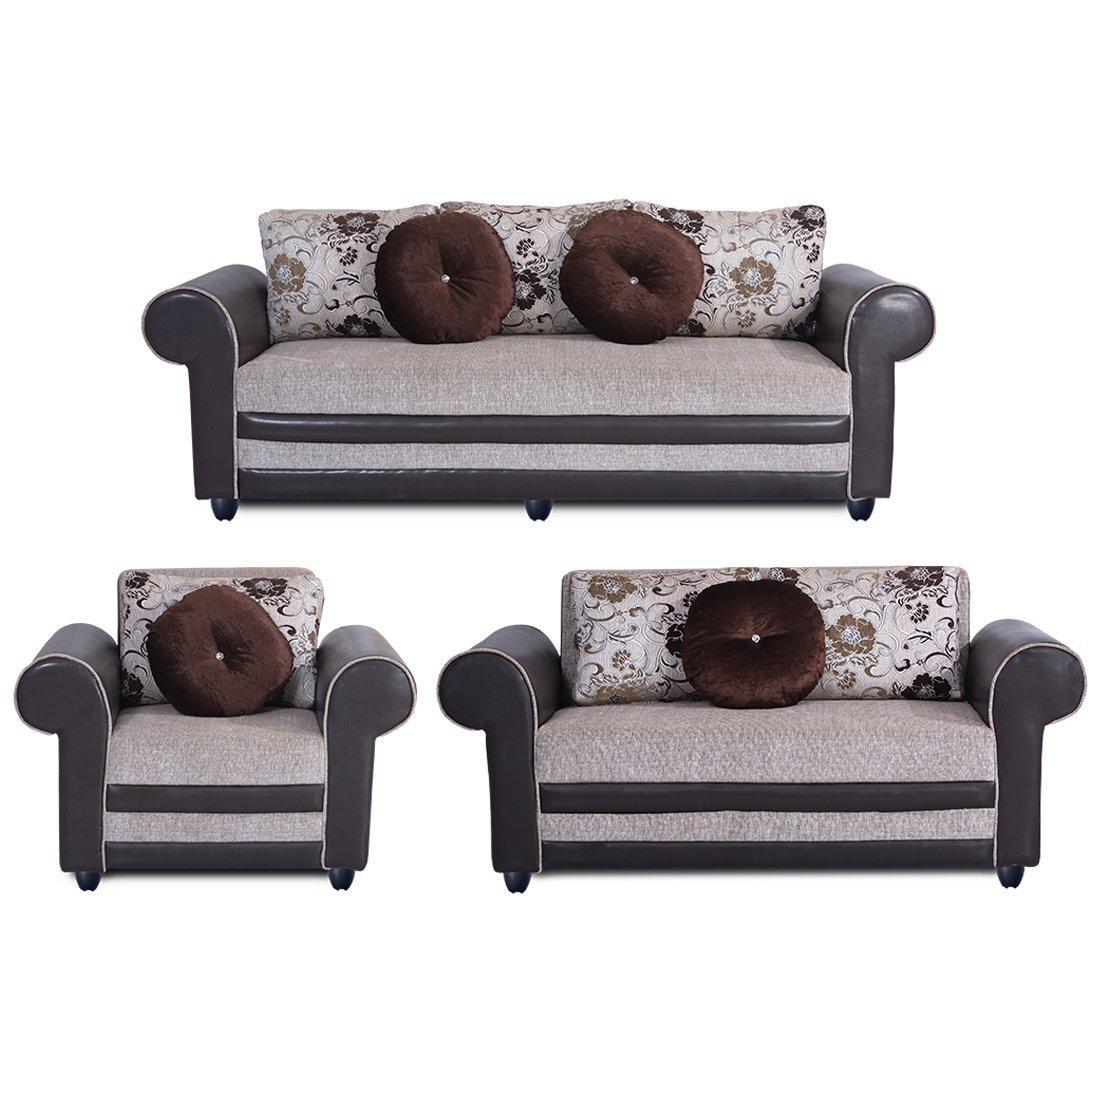 Alex Fabric Cream Brown Sofa Set